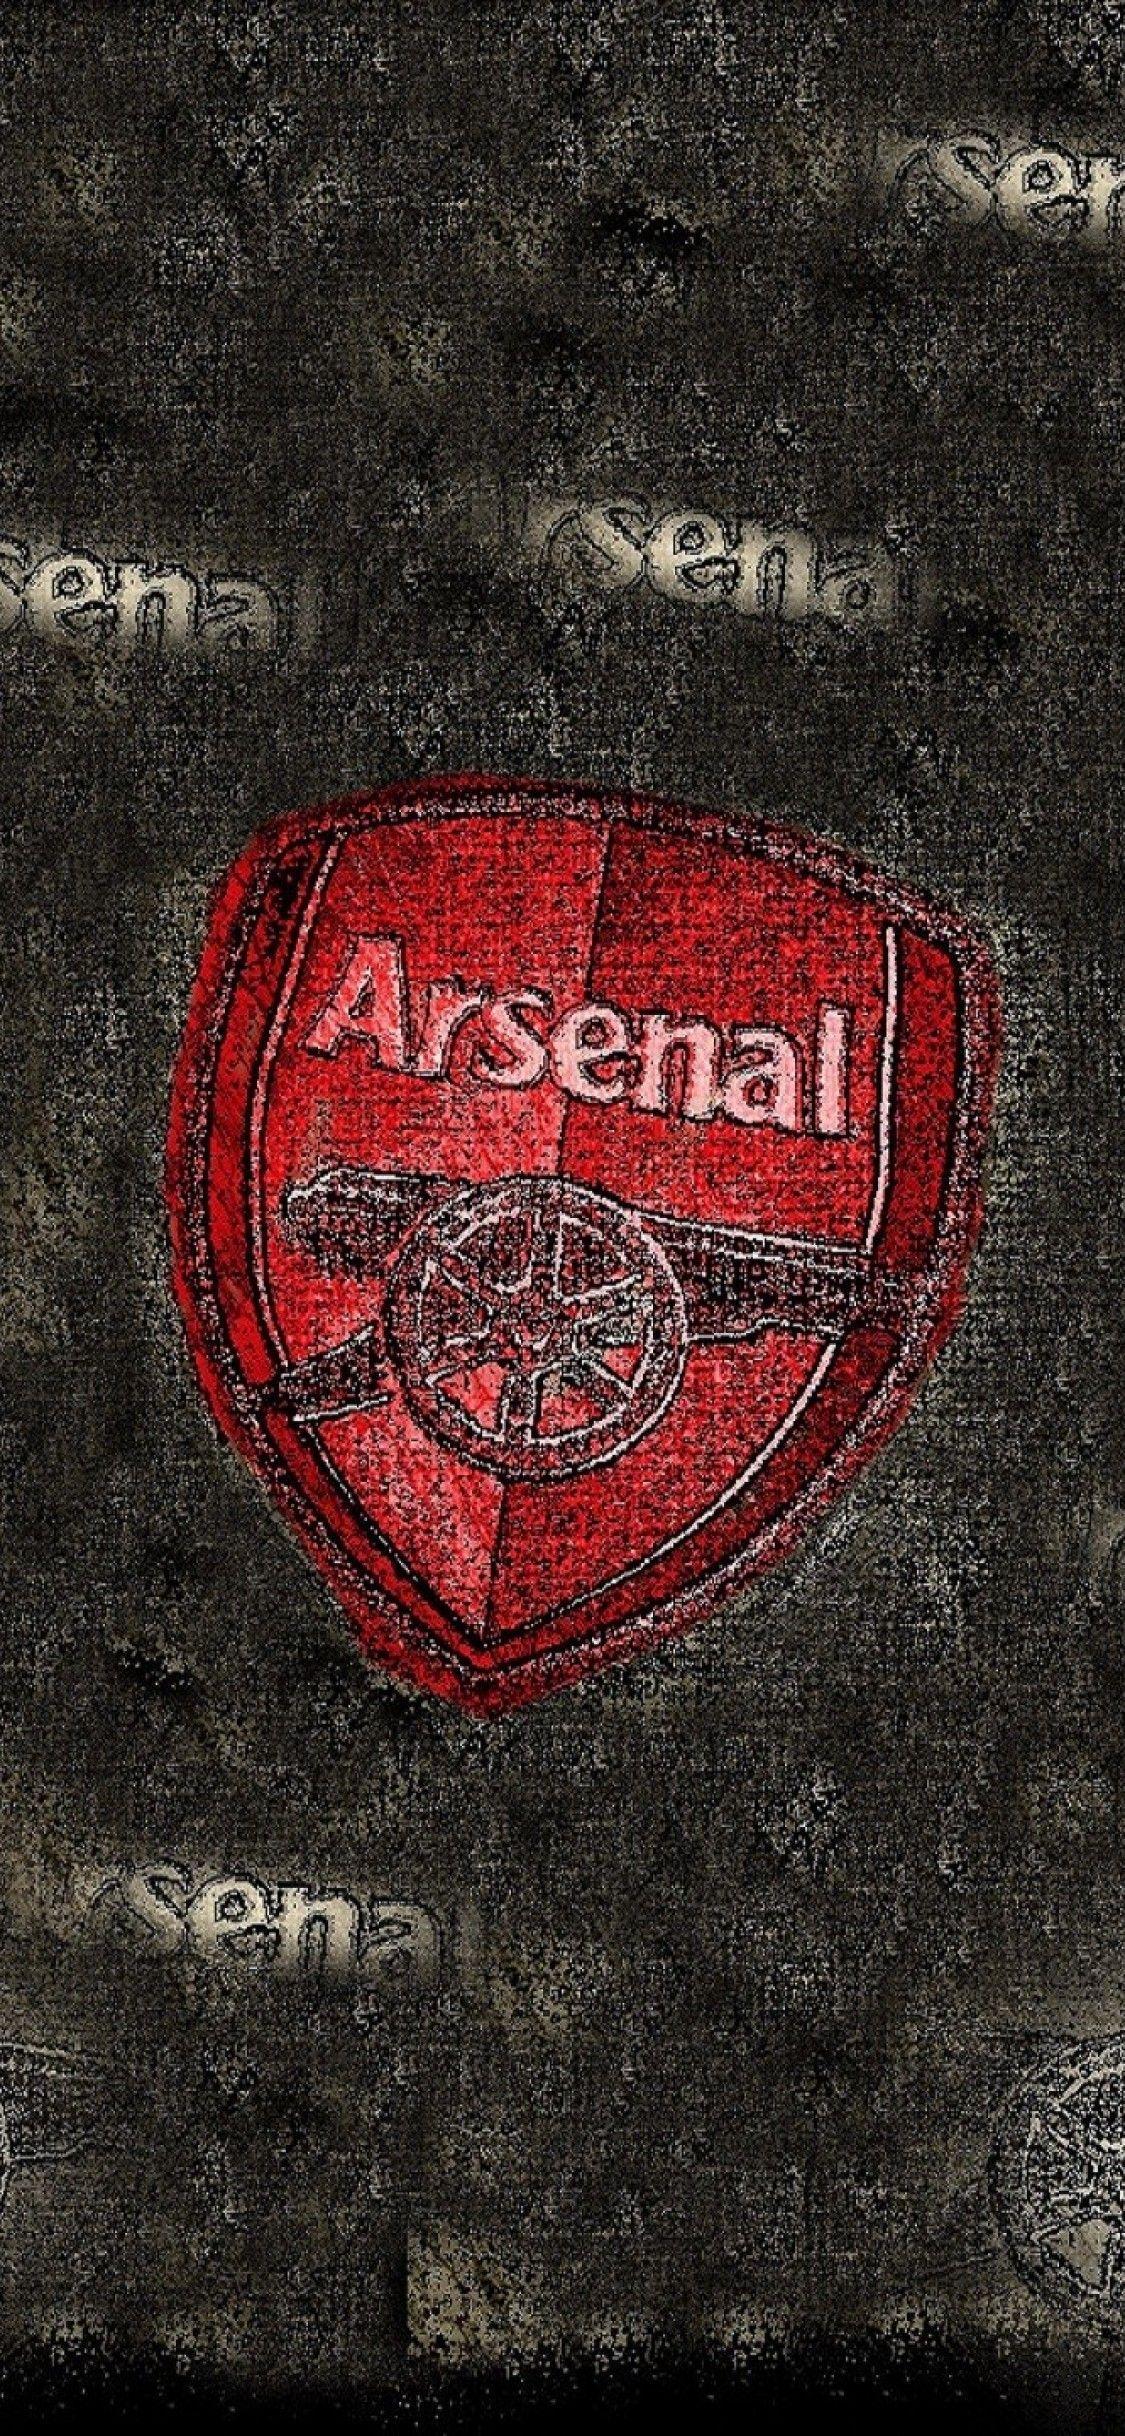 Arsenal Adidas Wallpapers - Wallpaper Cave